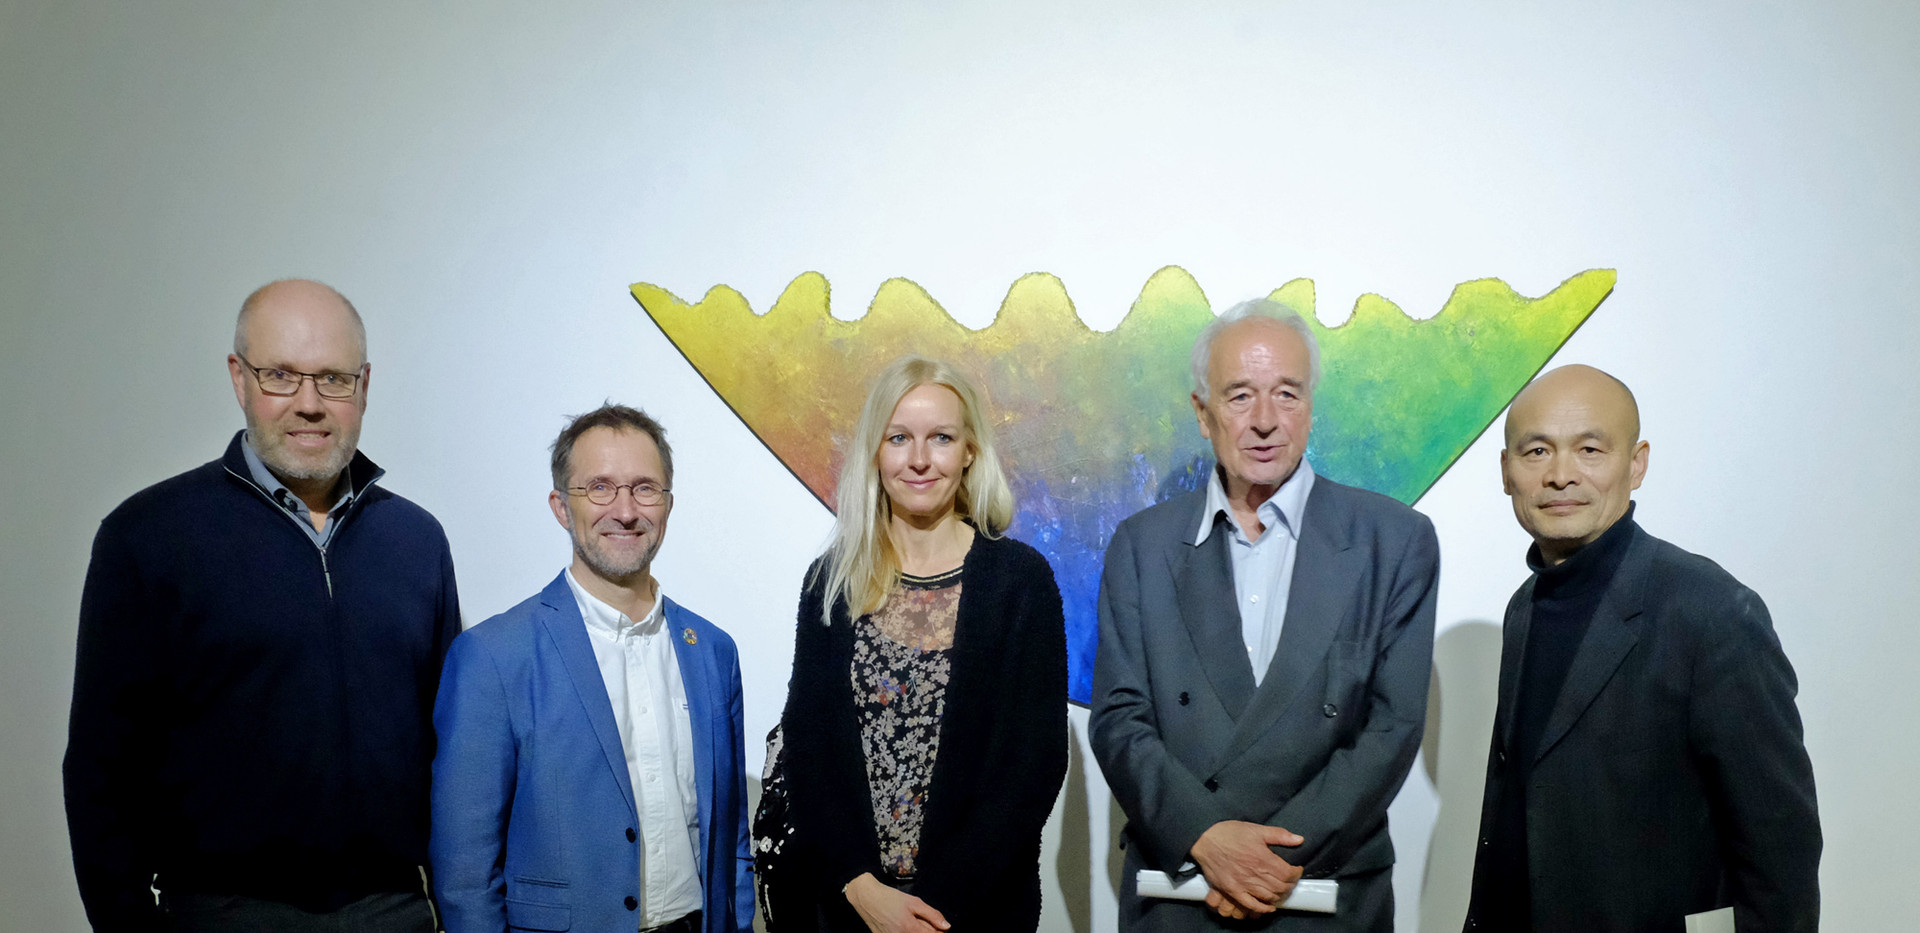 Christian Smarslik, Bernd Fesel, Astrid Lanzerath, Dieter Ronte, Ren Rong